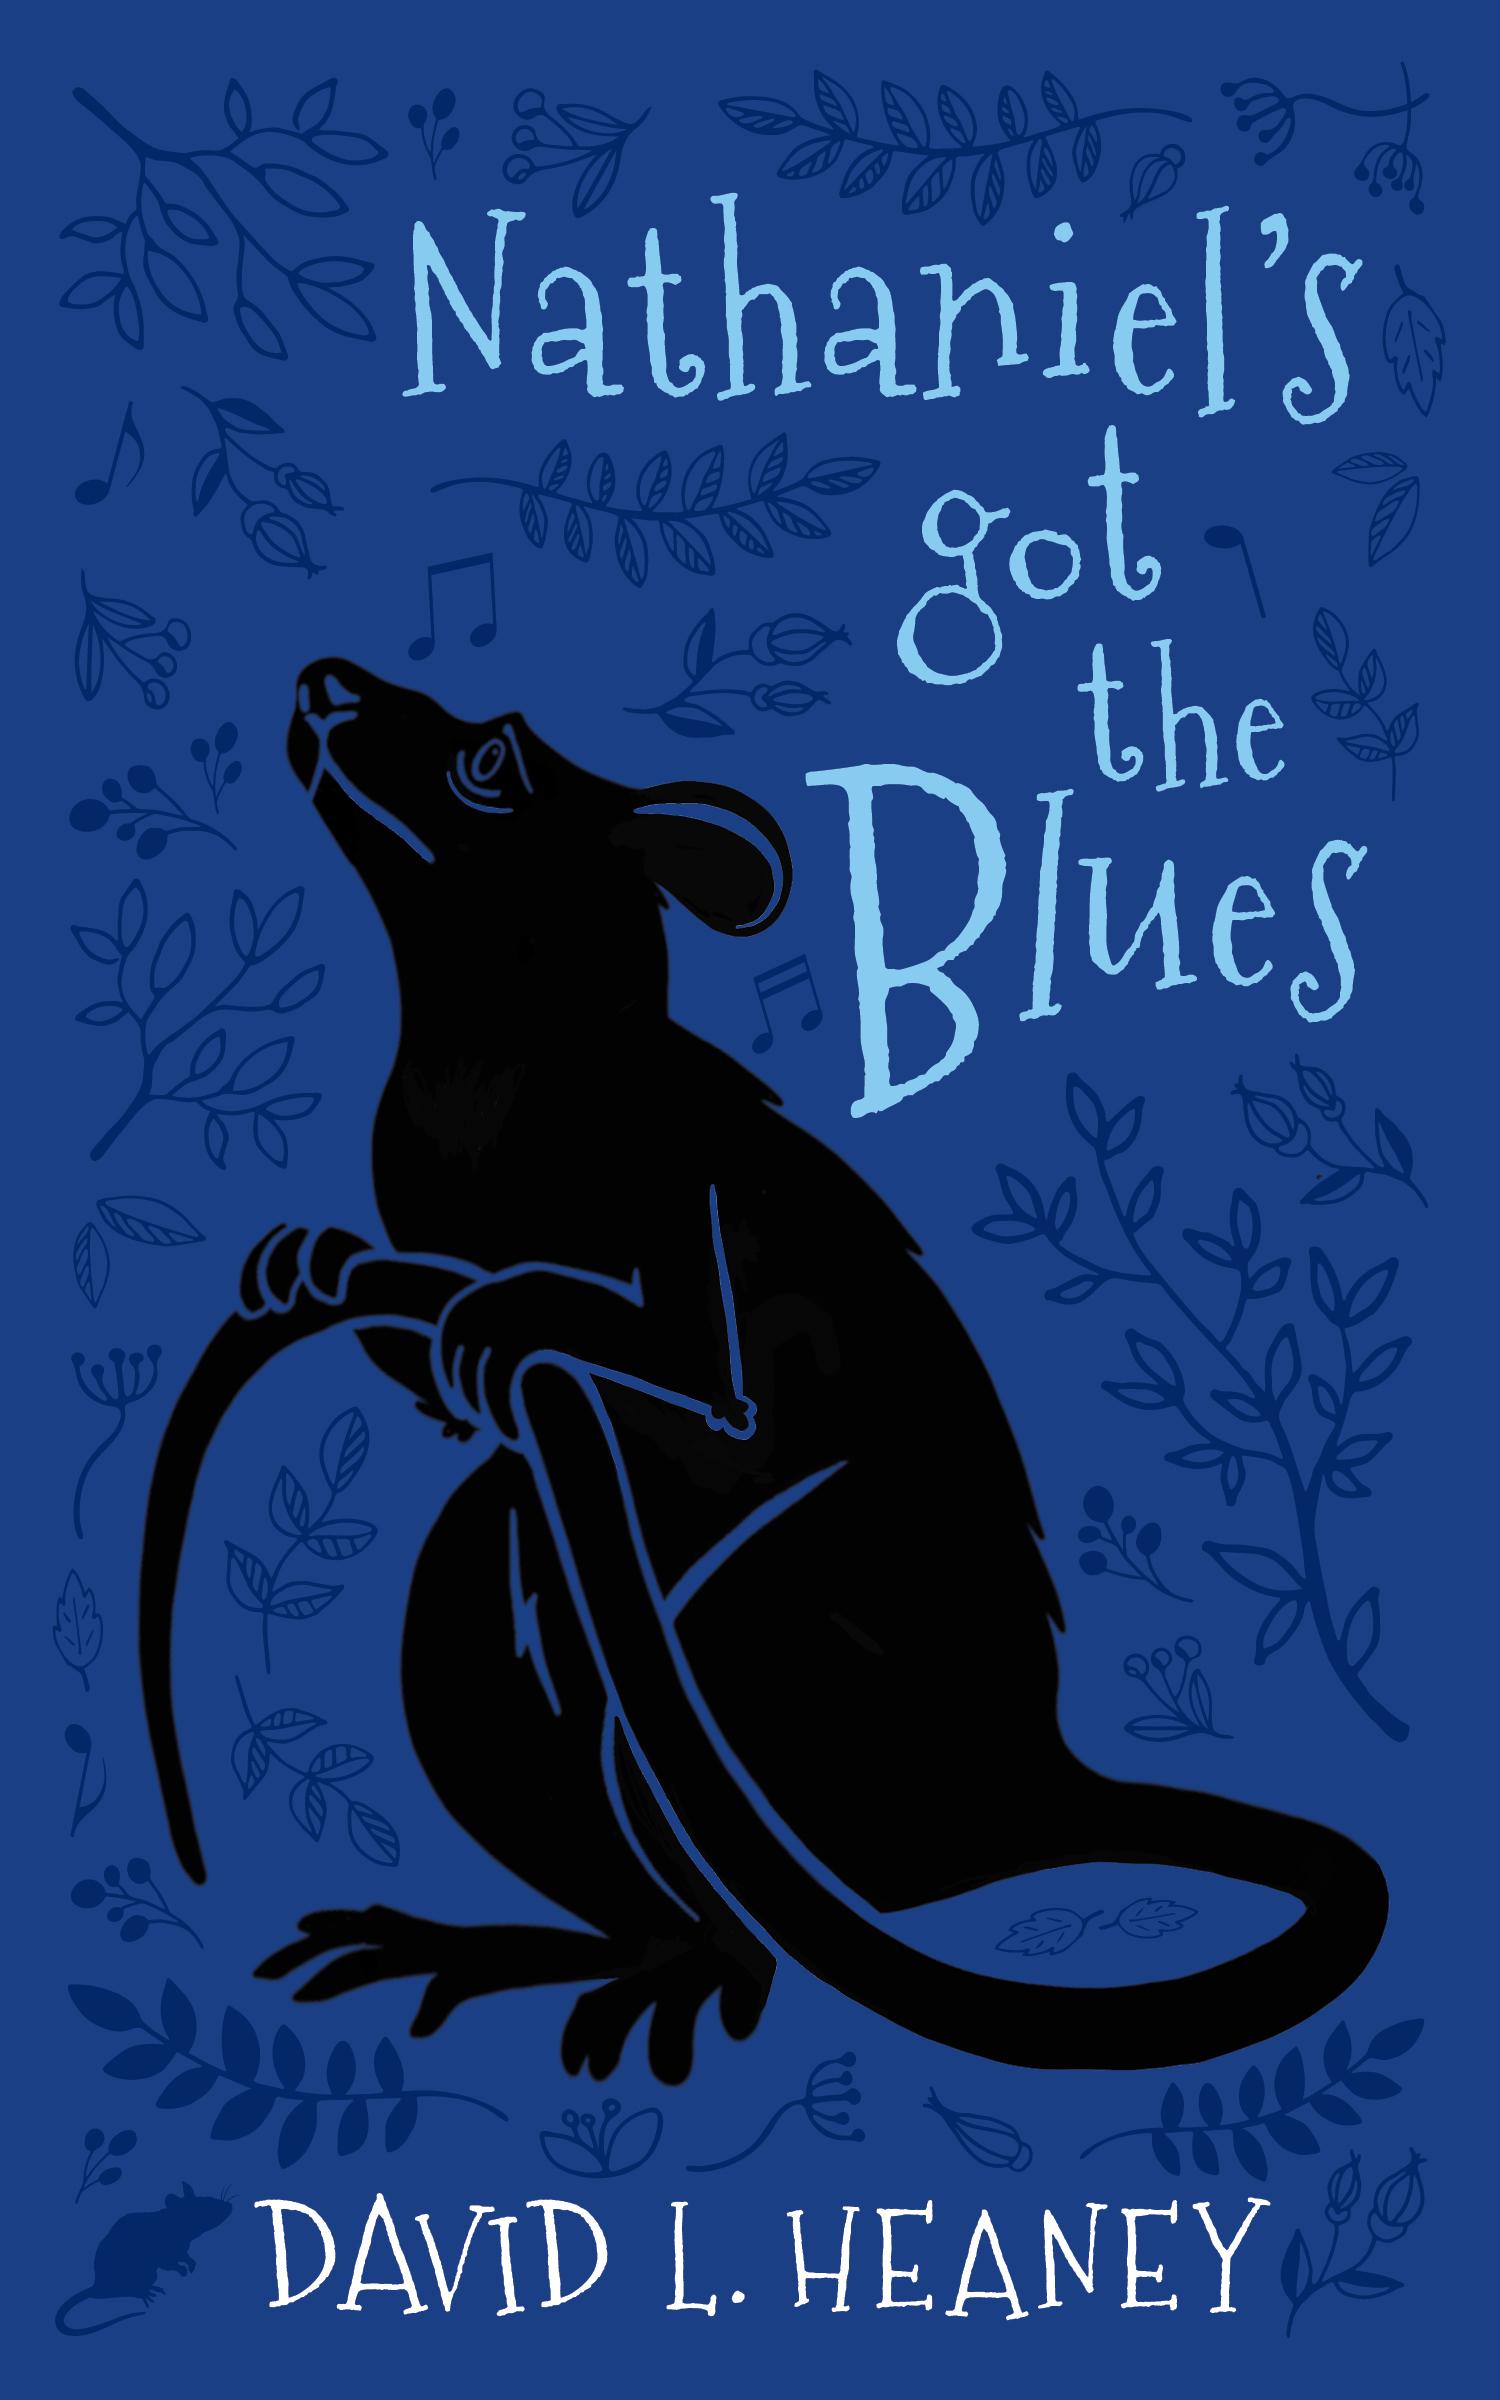 Nathaniel's Got the Blues